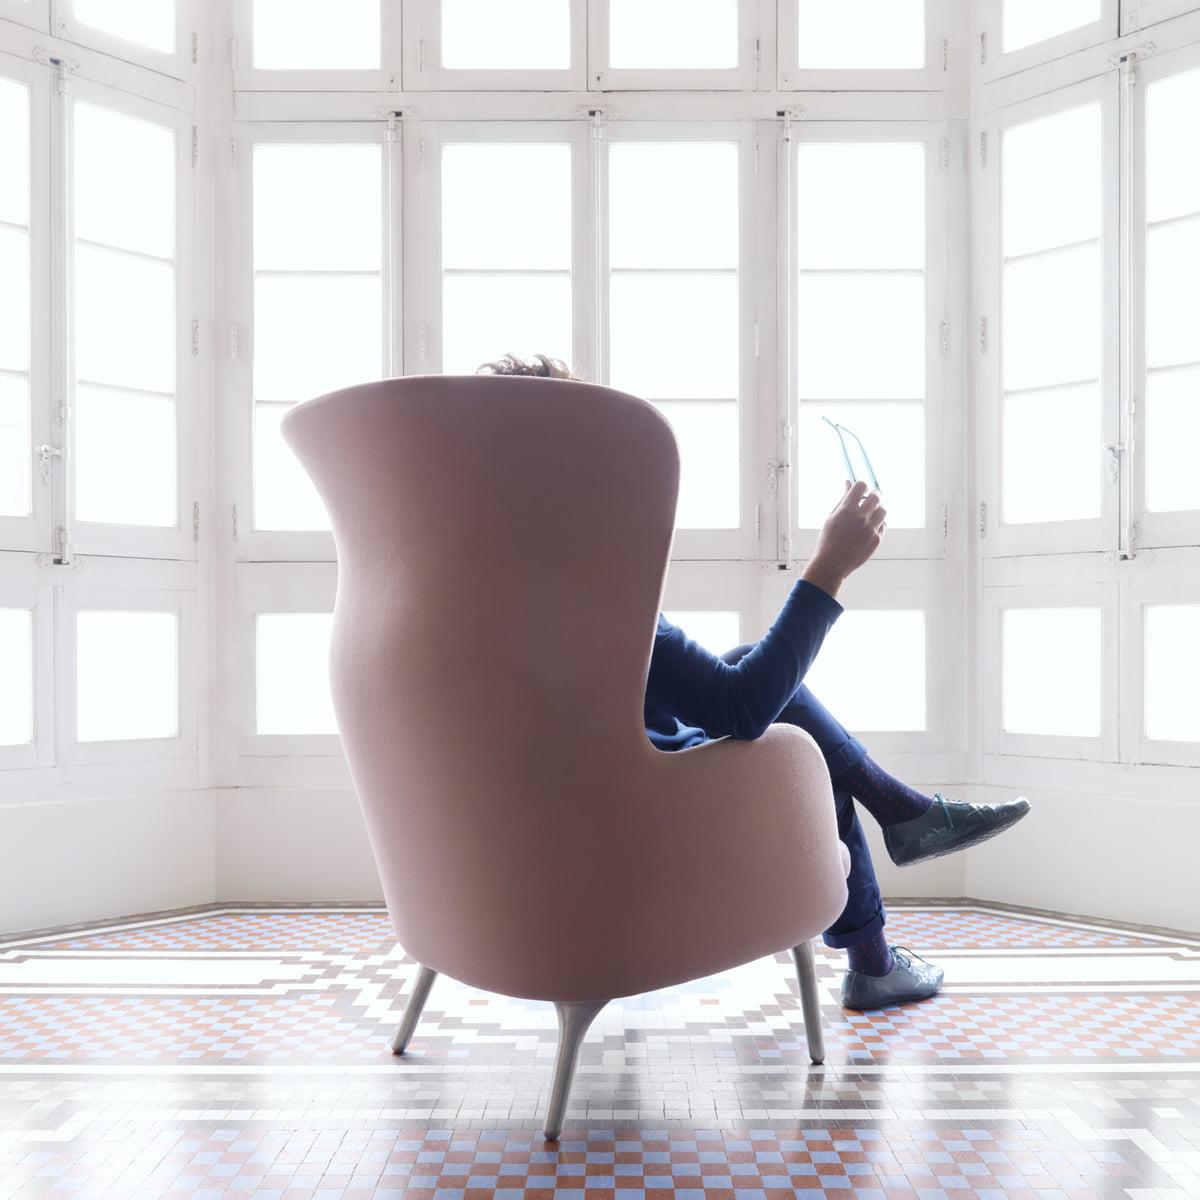 Fritz Hansen   Ro Sessel, Pink   Jaime Hayon, Sitzend, Rückseite